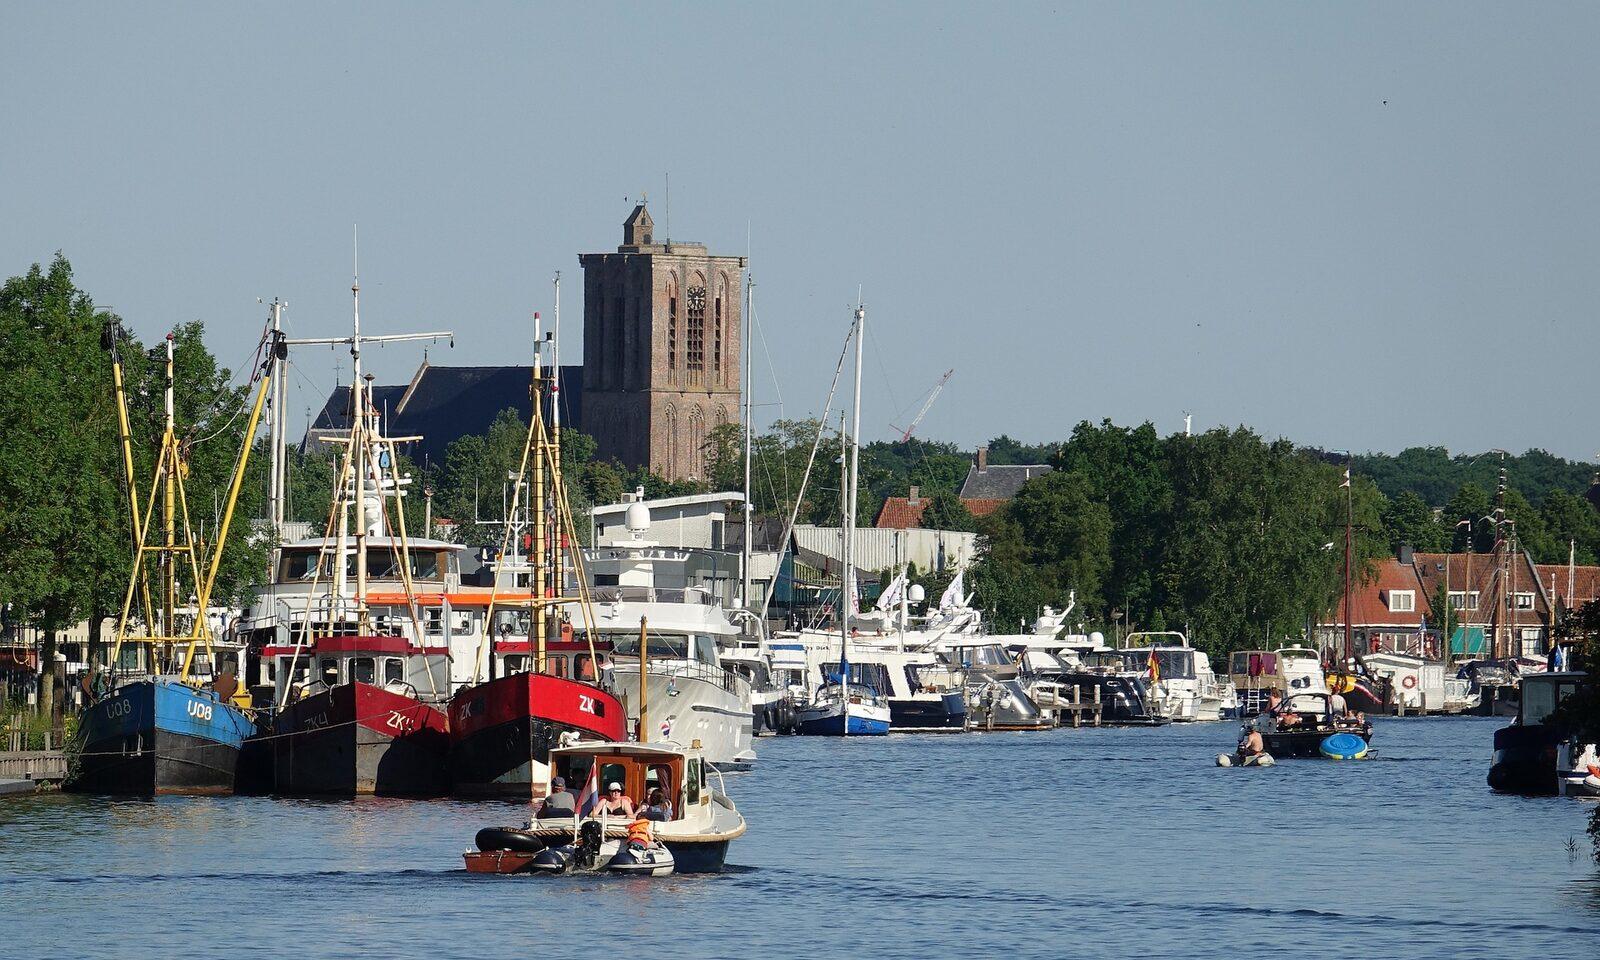 Hanseatic town of Elburg